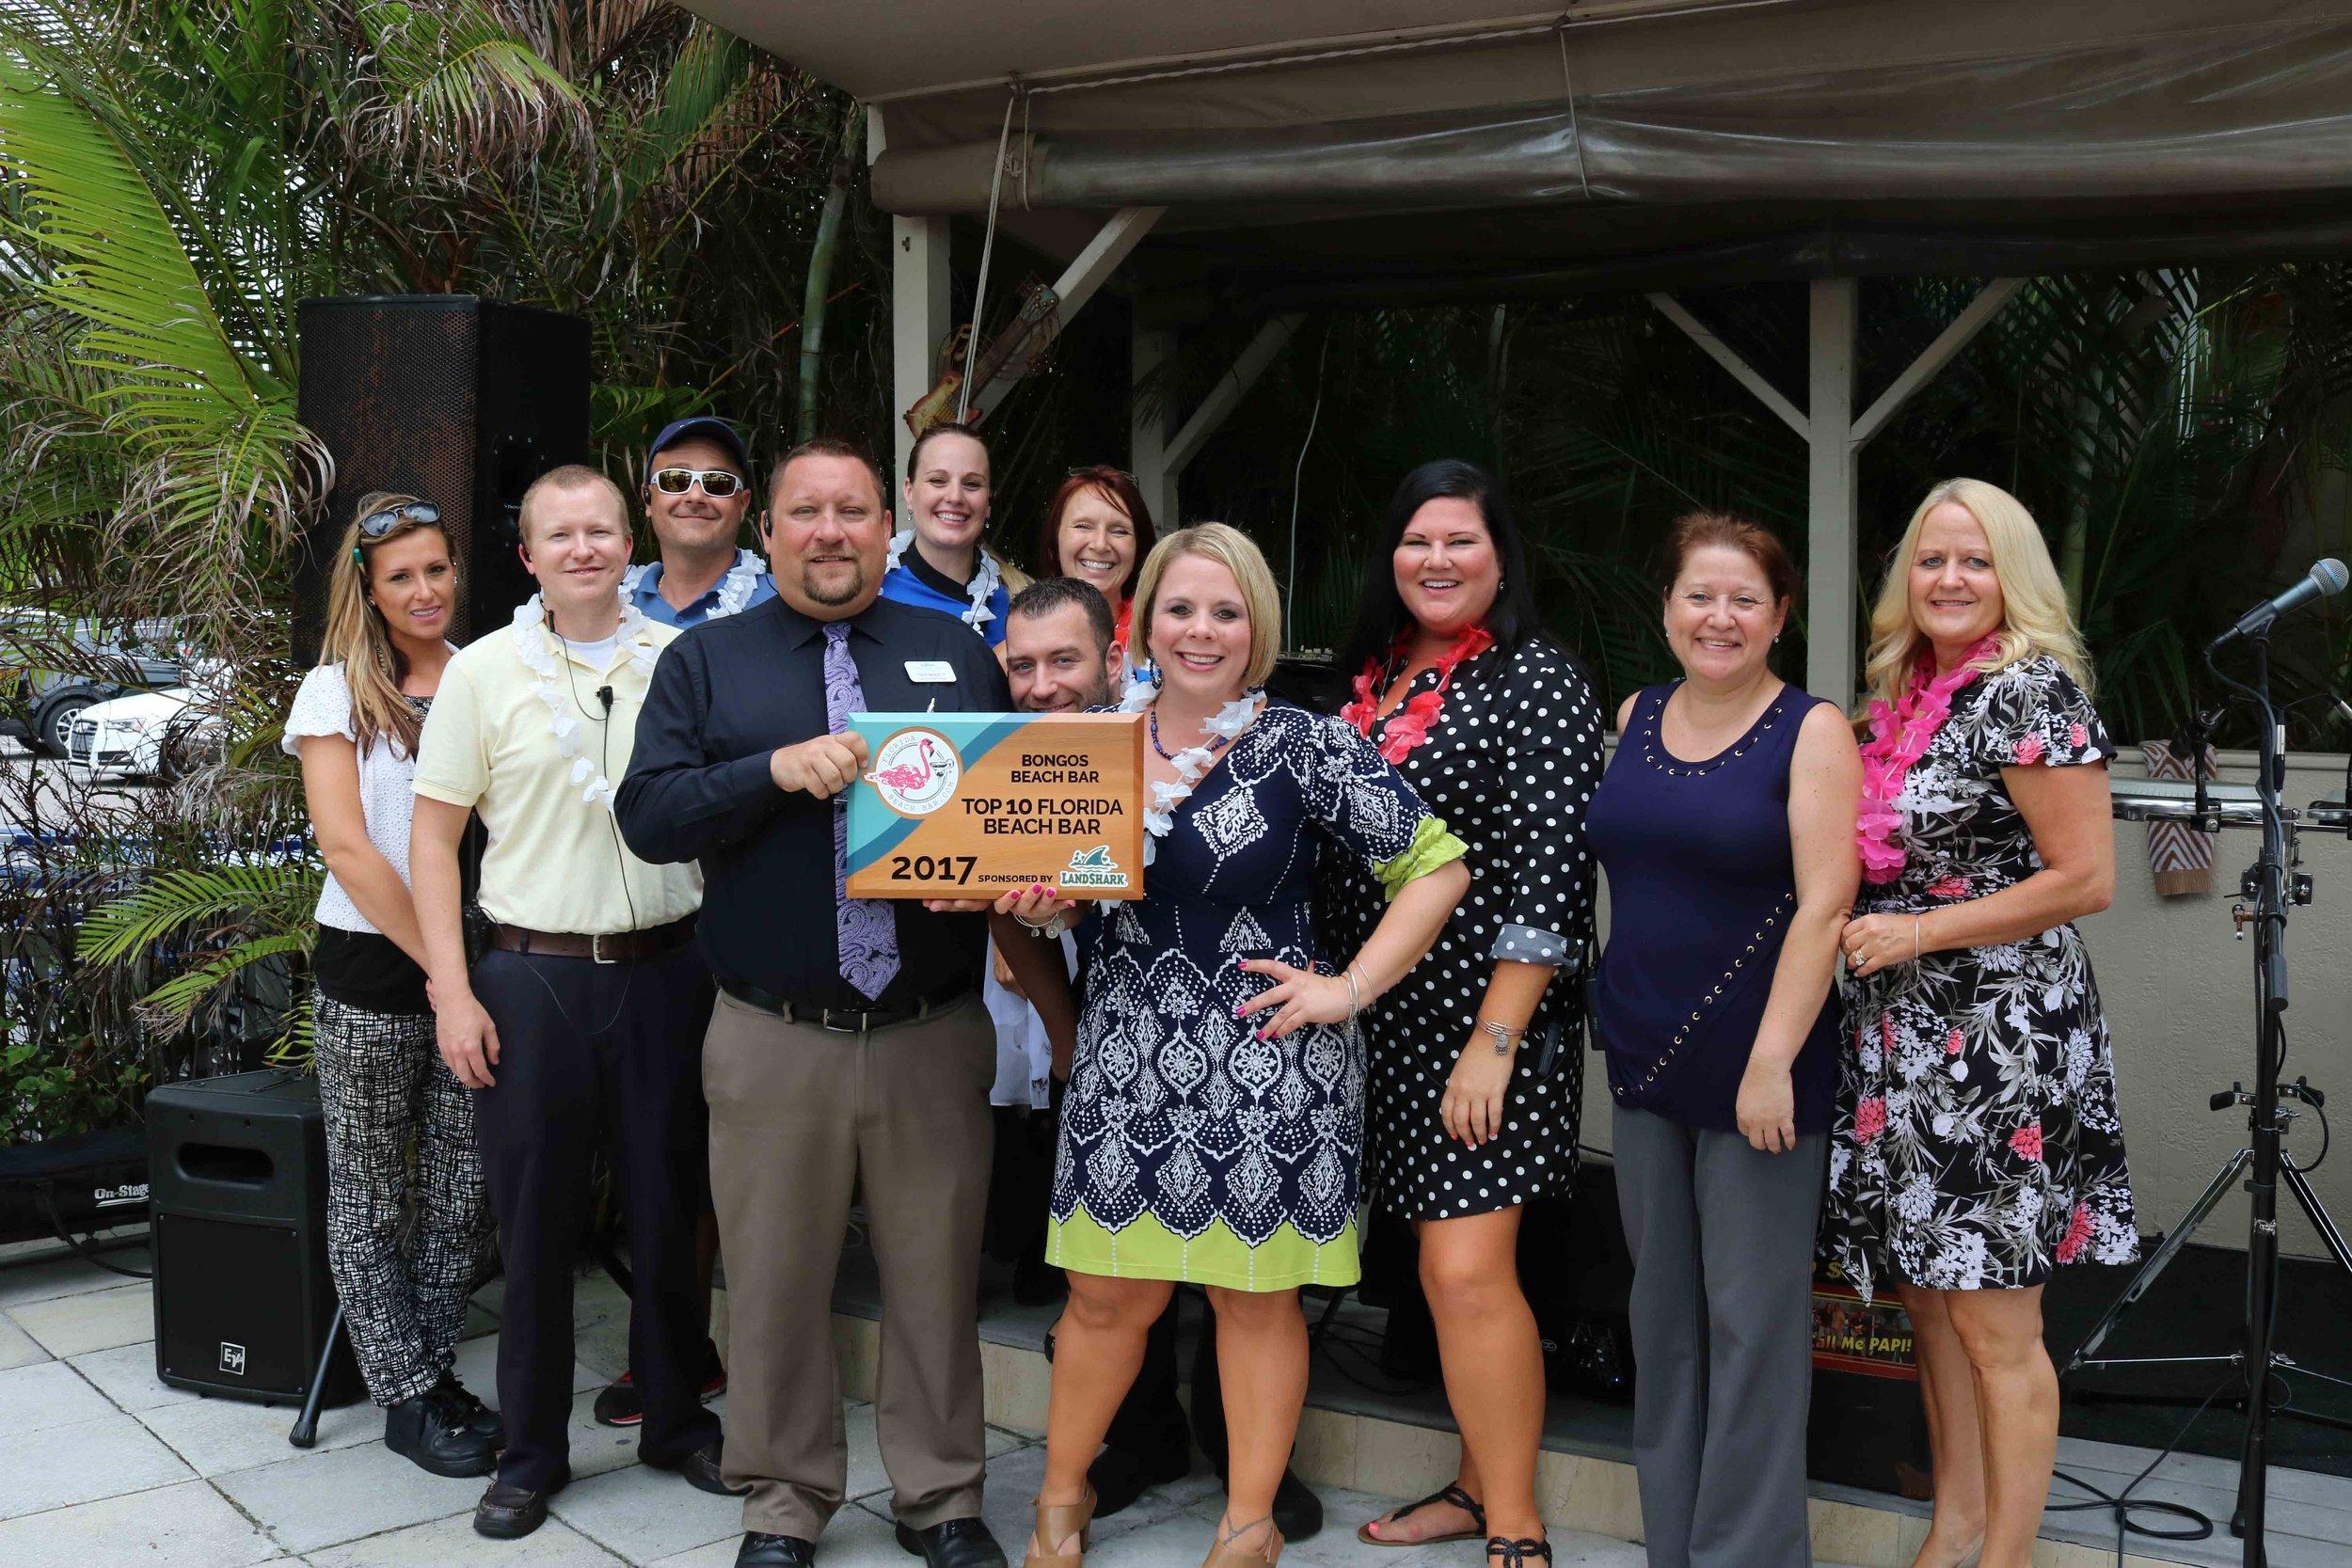 The staff of Bongos Beach Bar accepts the 2017 Top Florida Beach Bar award.